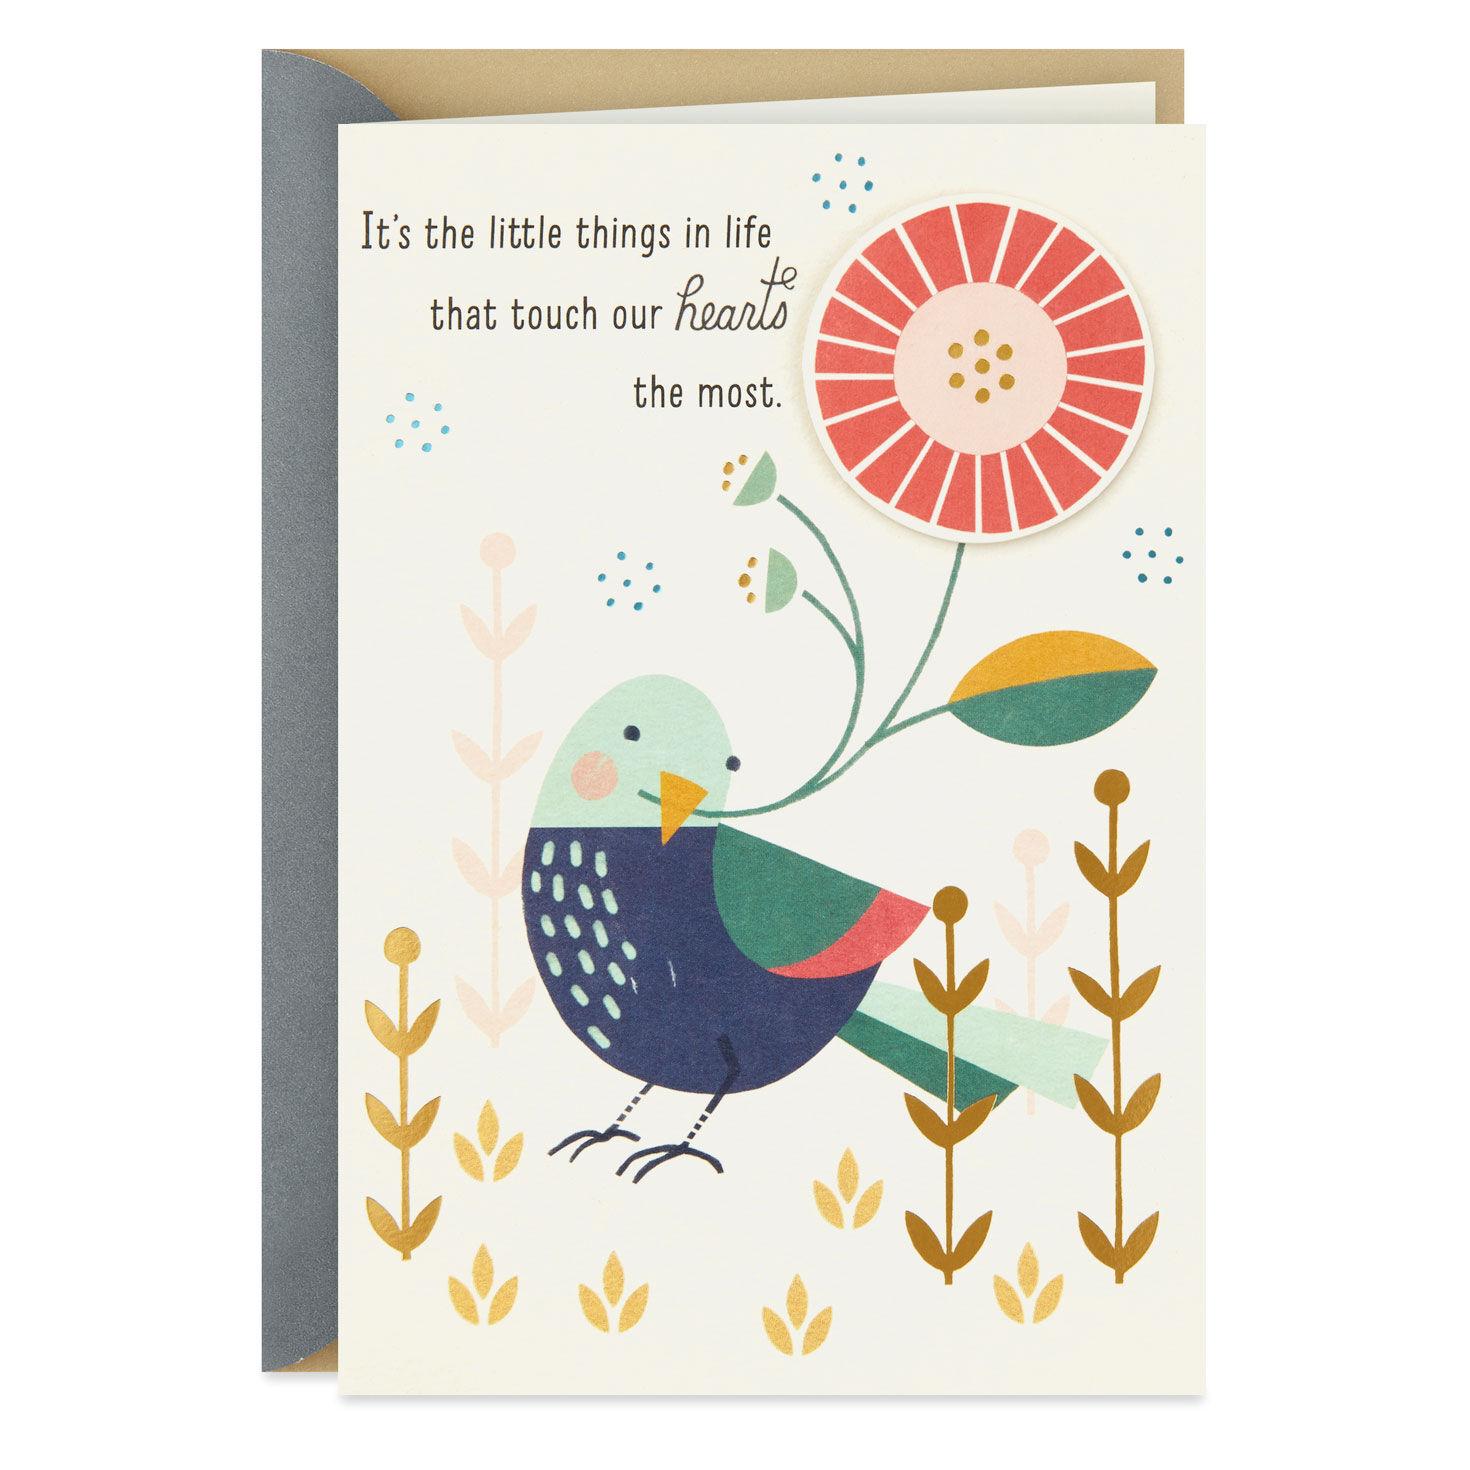 PEANUTS SNOOPY *THANKSGIVING* HALLMARK GREETING CARD *Thankful Word* NEW!